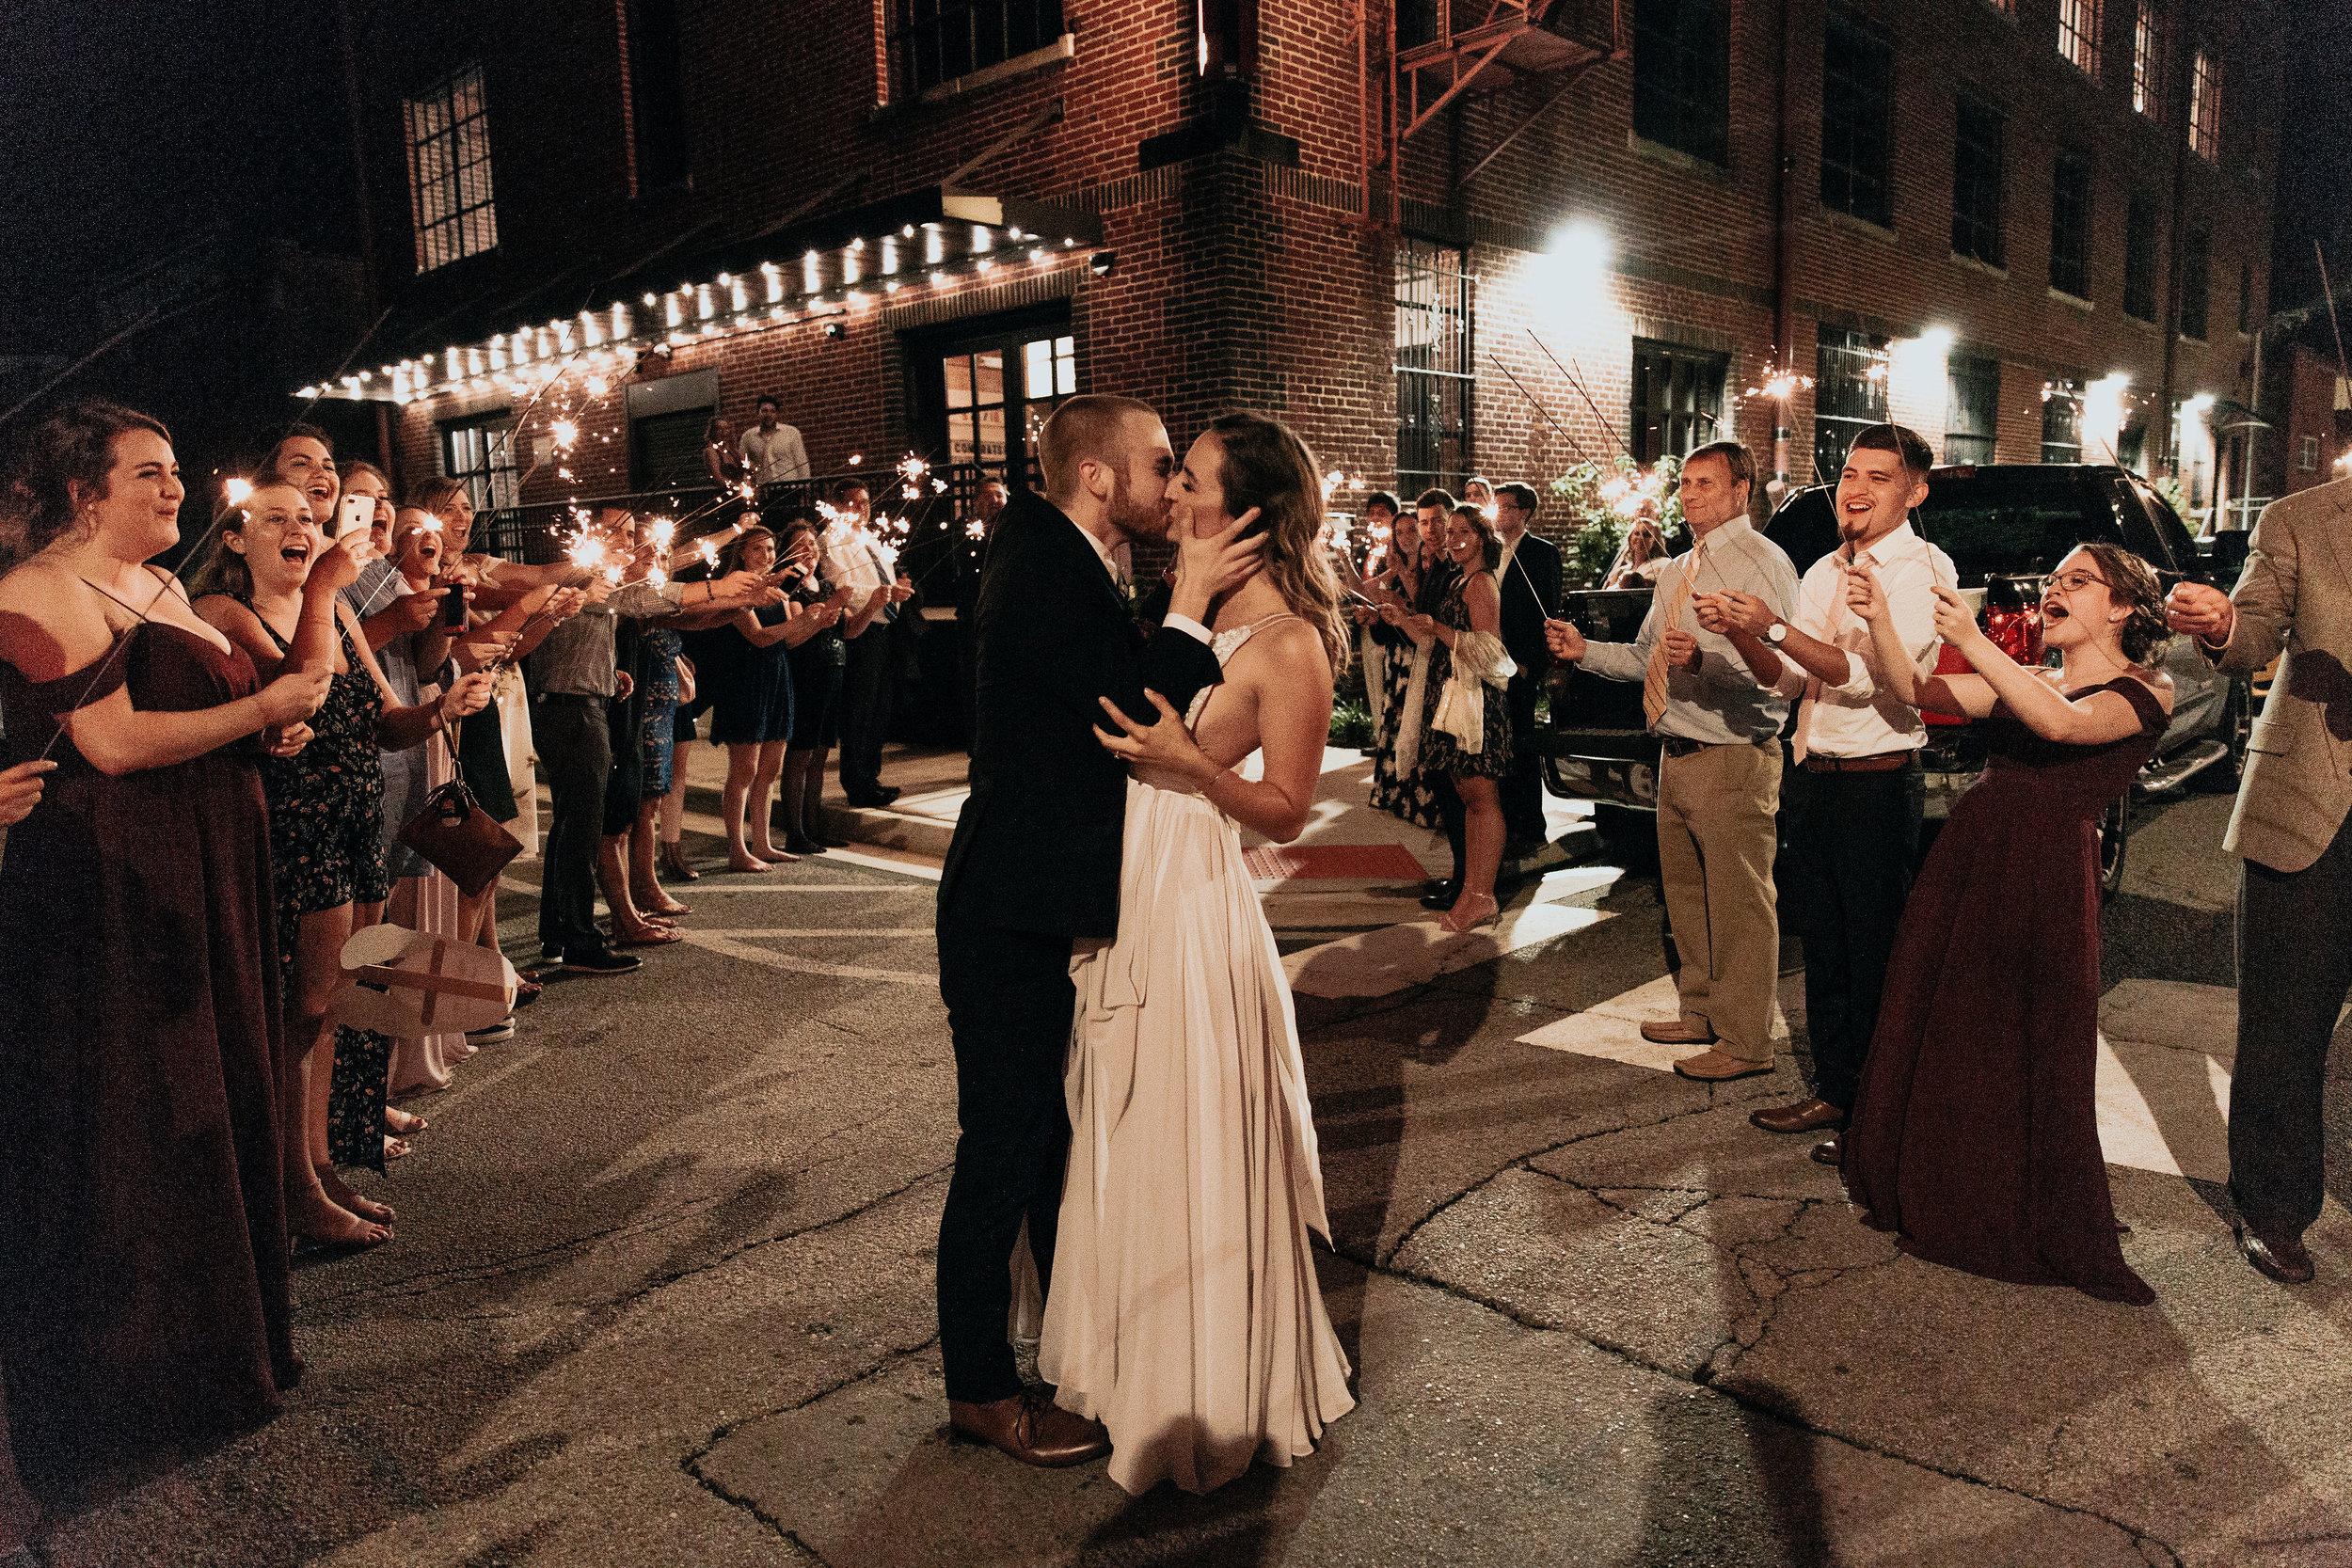 Kiersten + Matt's Urban Bohemian Wedding at The Turnbull